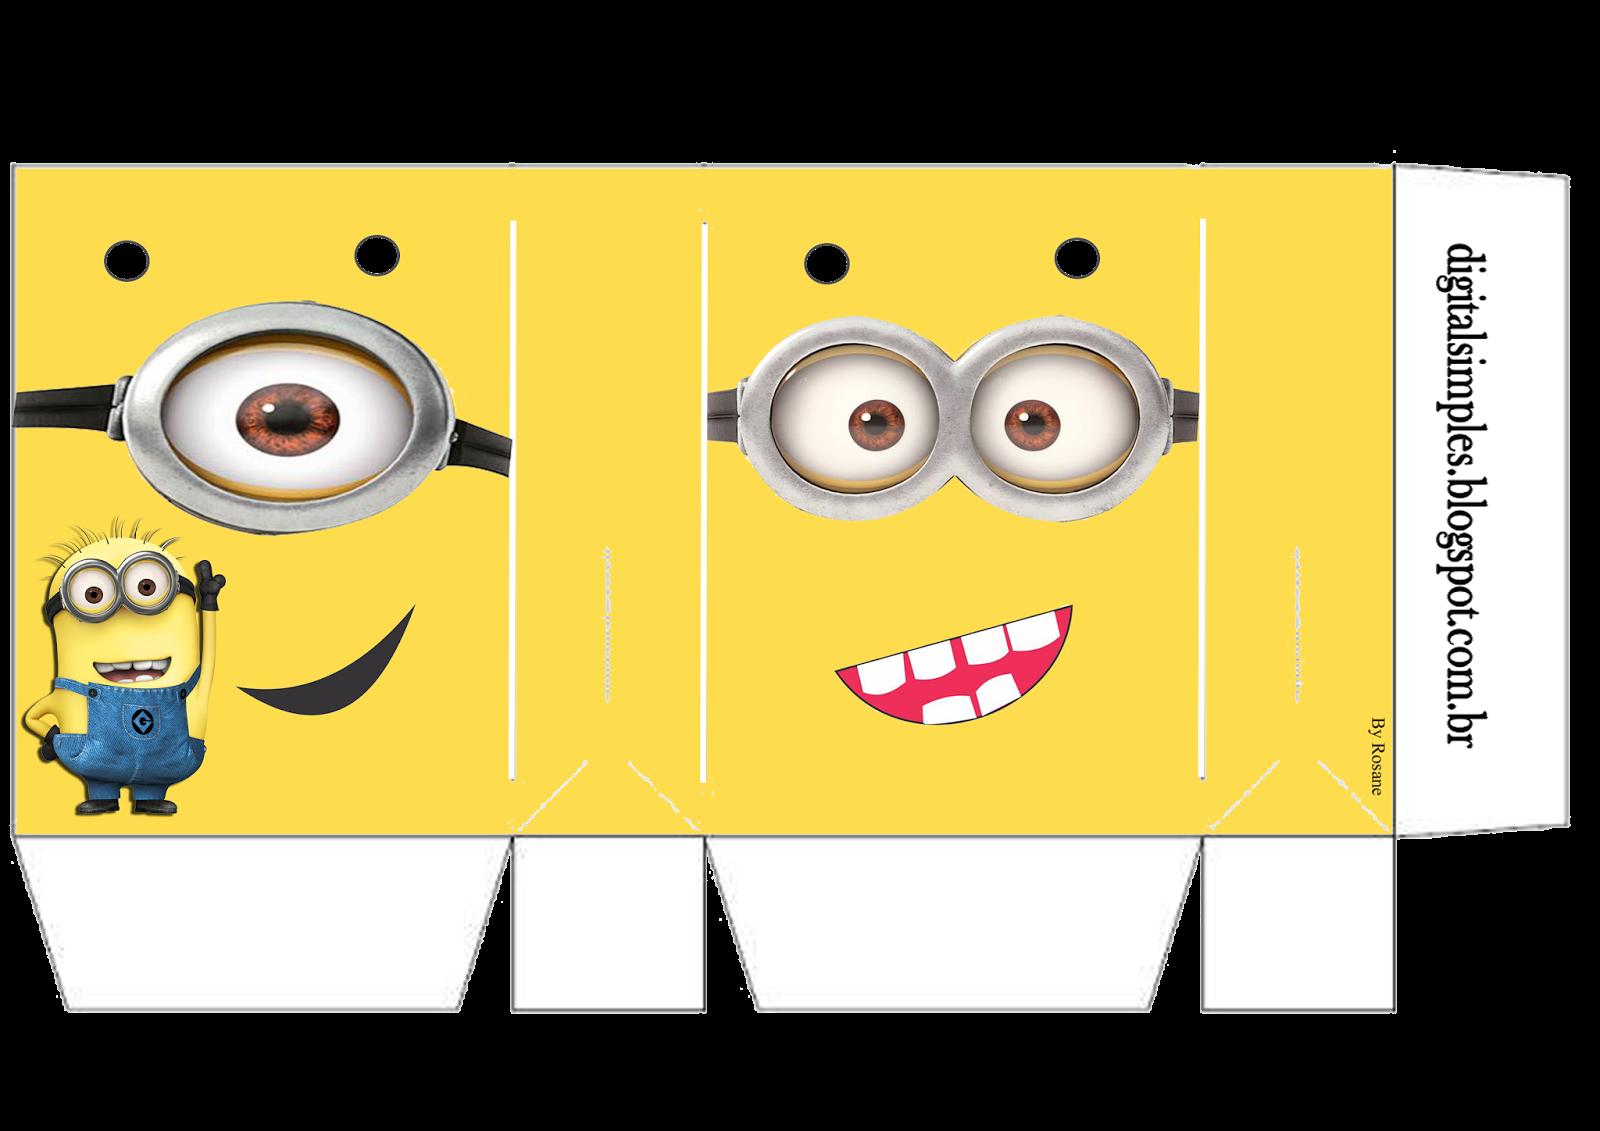 Imagenes de los minions para imprimir en a4 gratis apexwallpapers